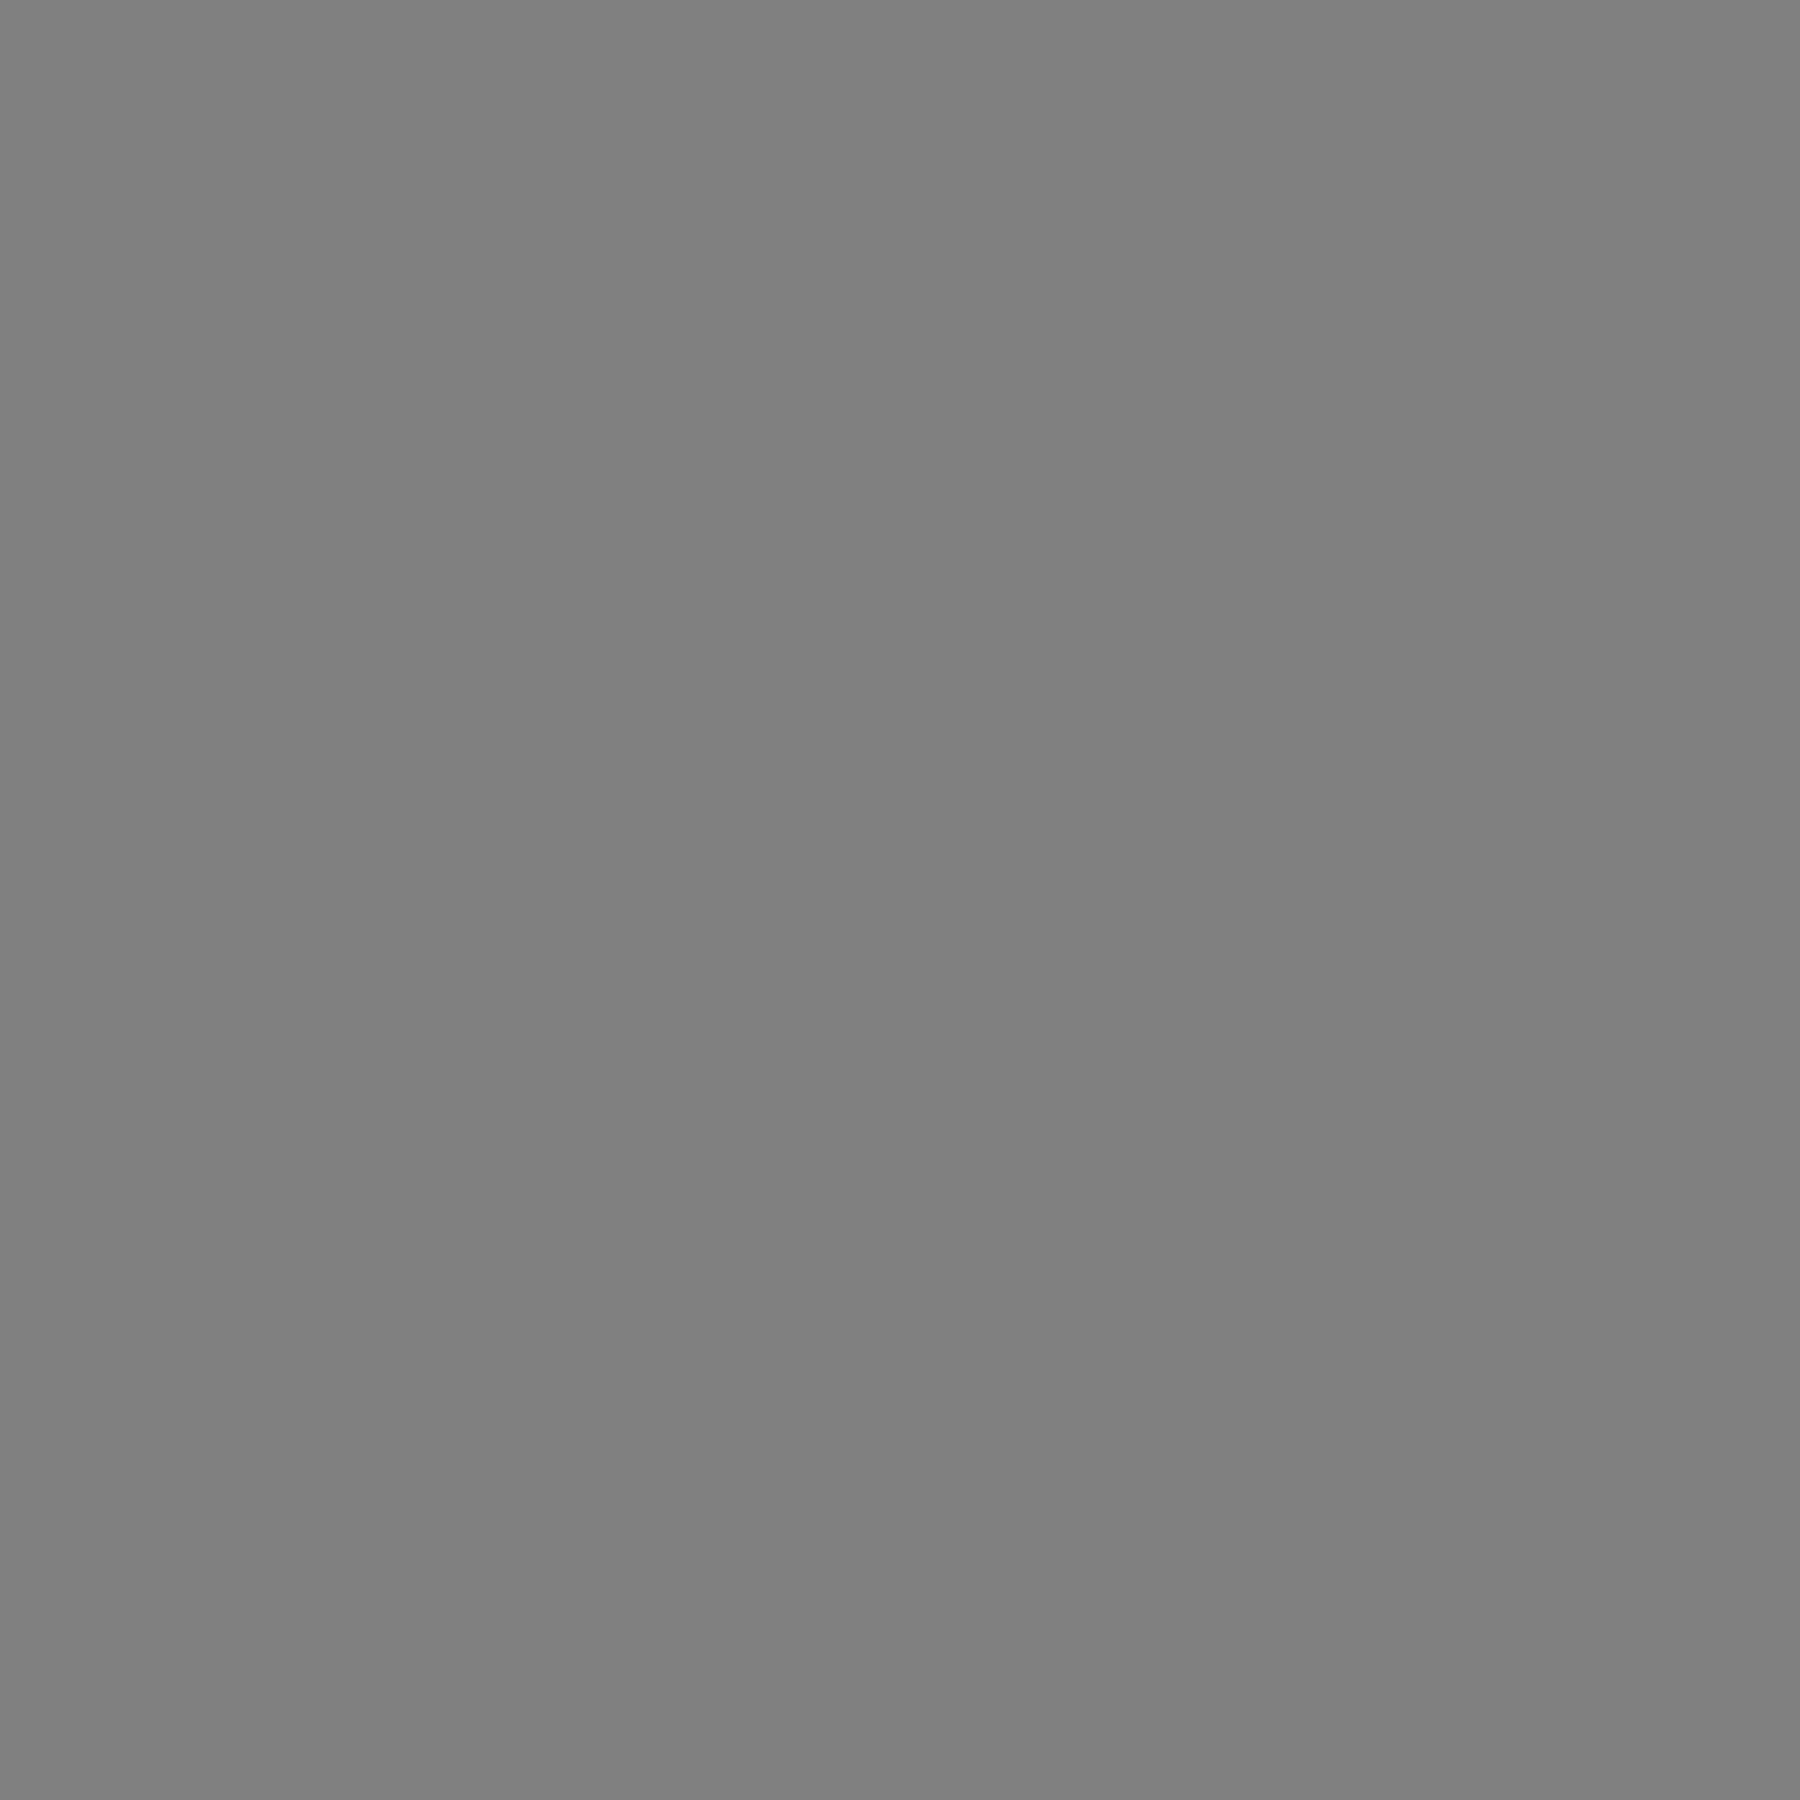 portait placeholder 7.jpg